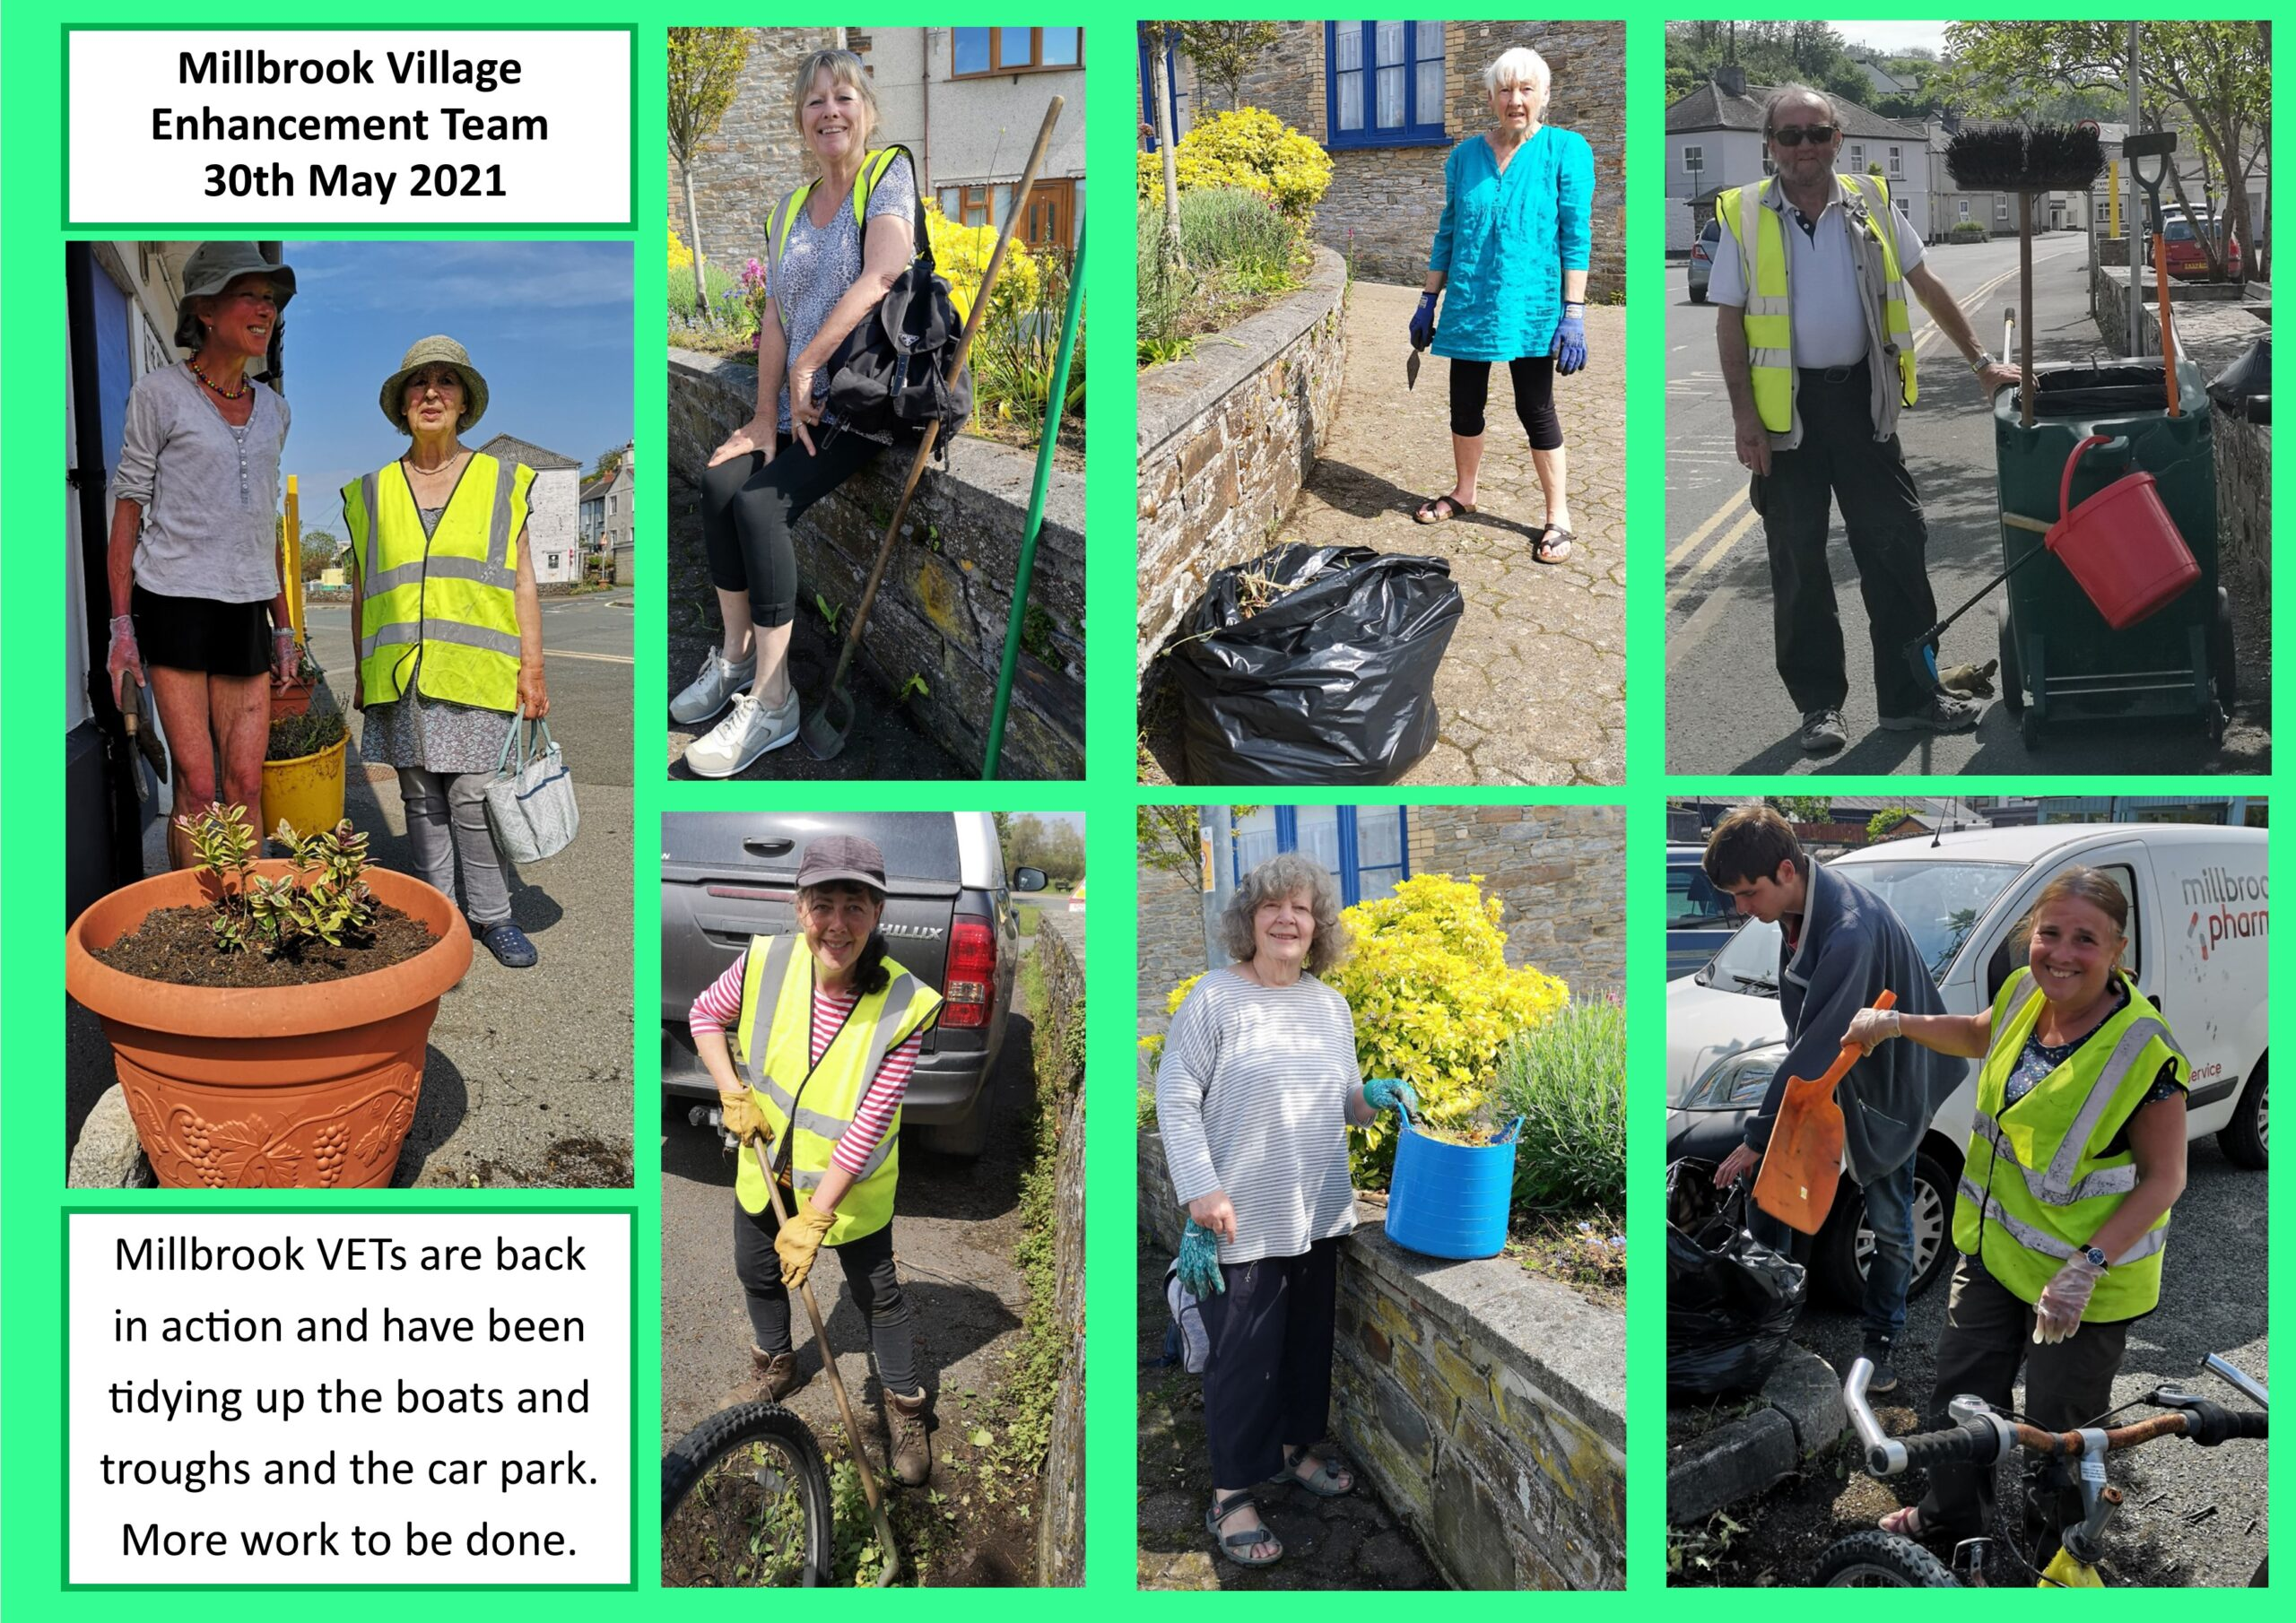 Millbrook Village Enhancement Team